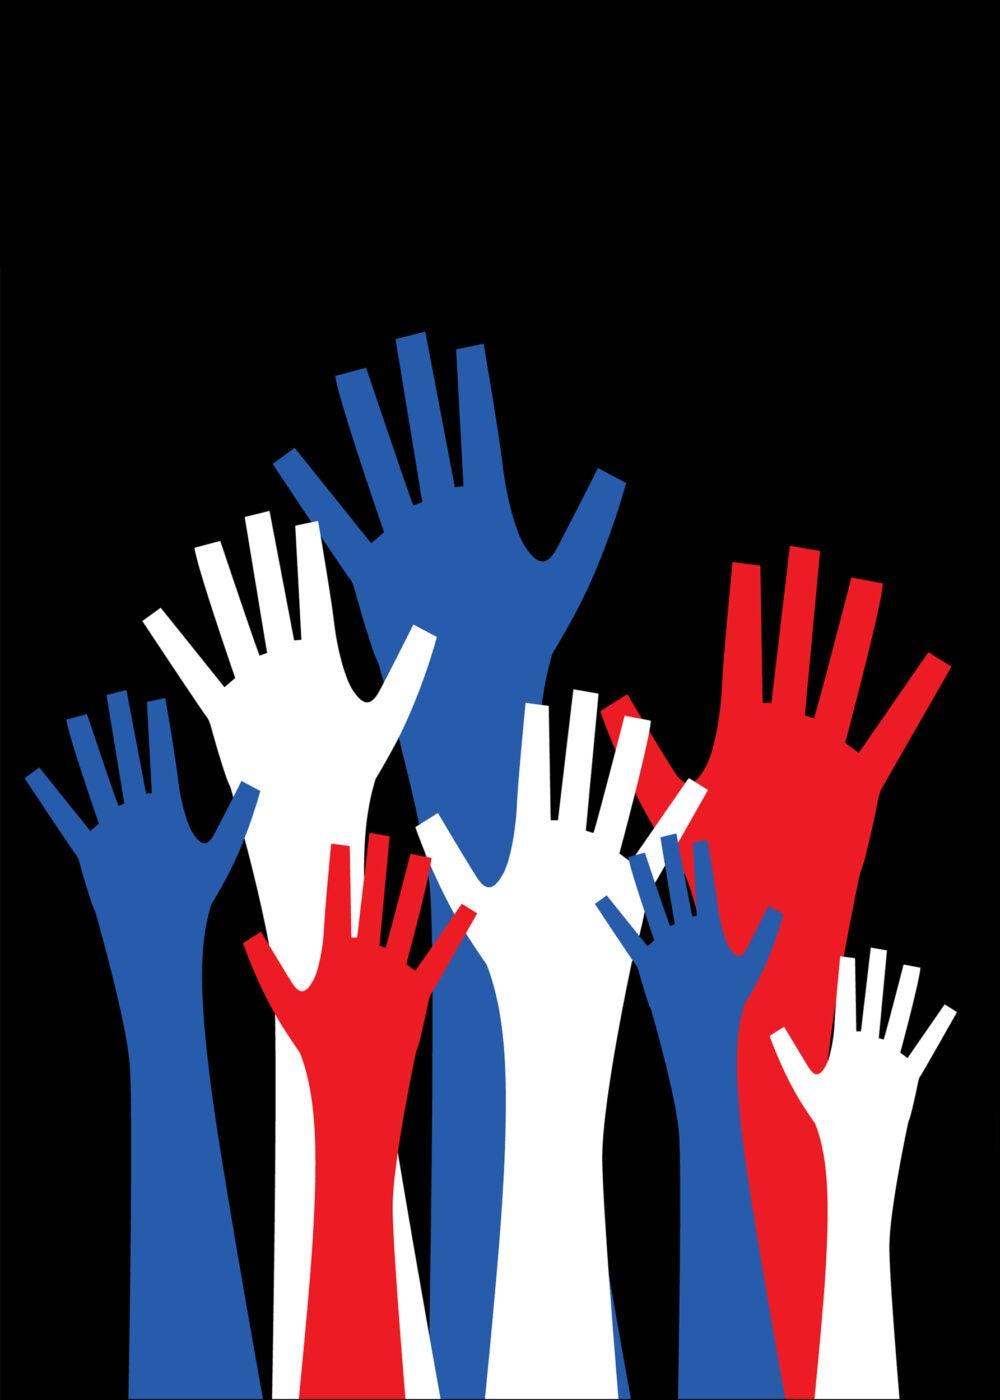 Raised hands illustration.